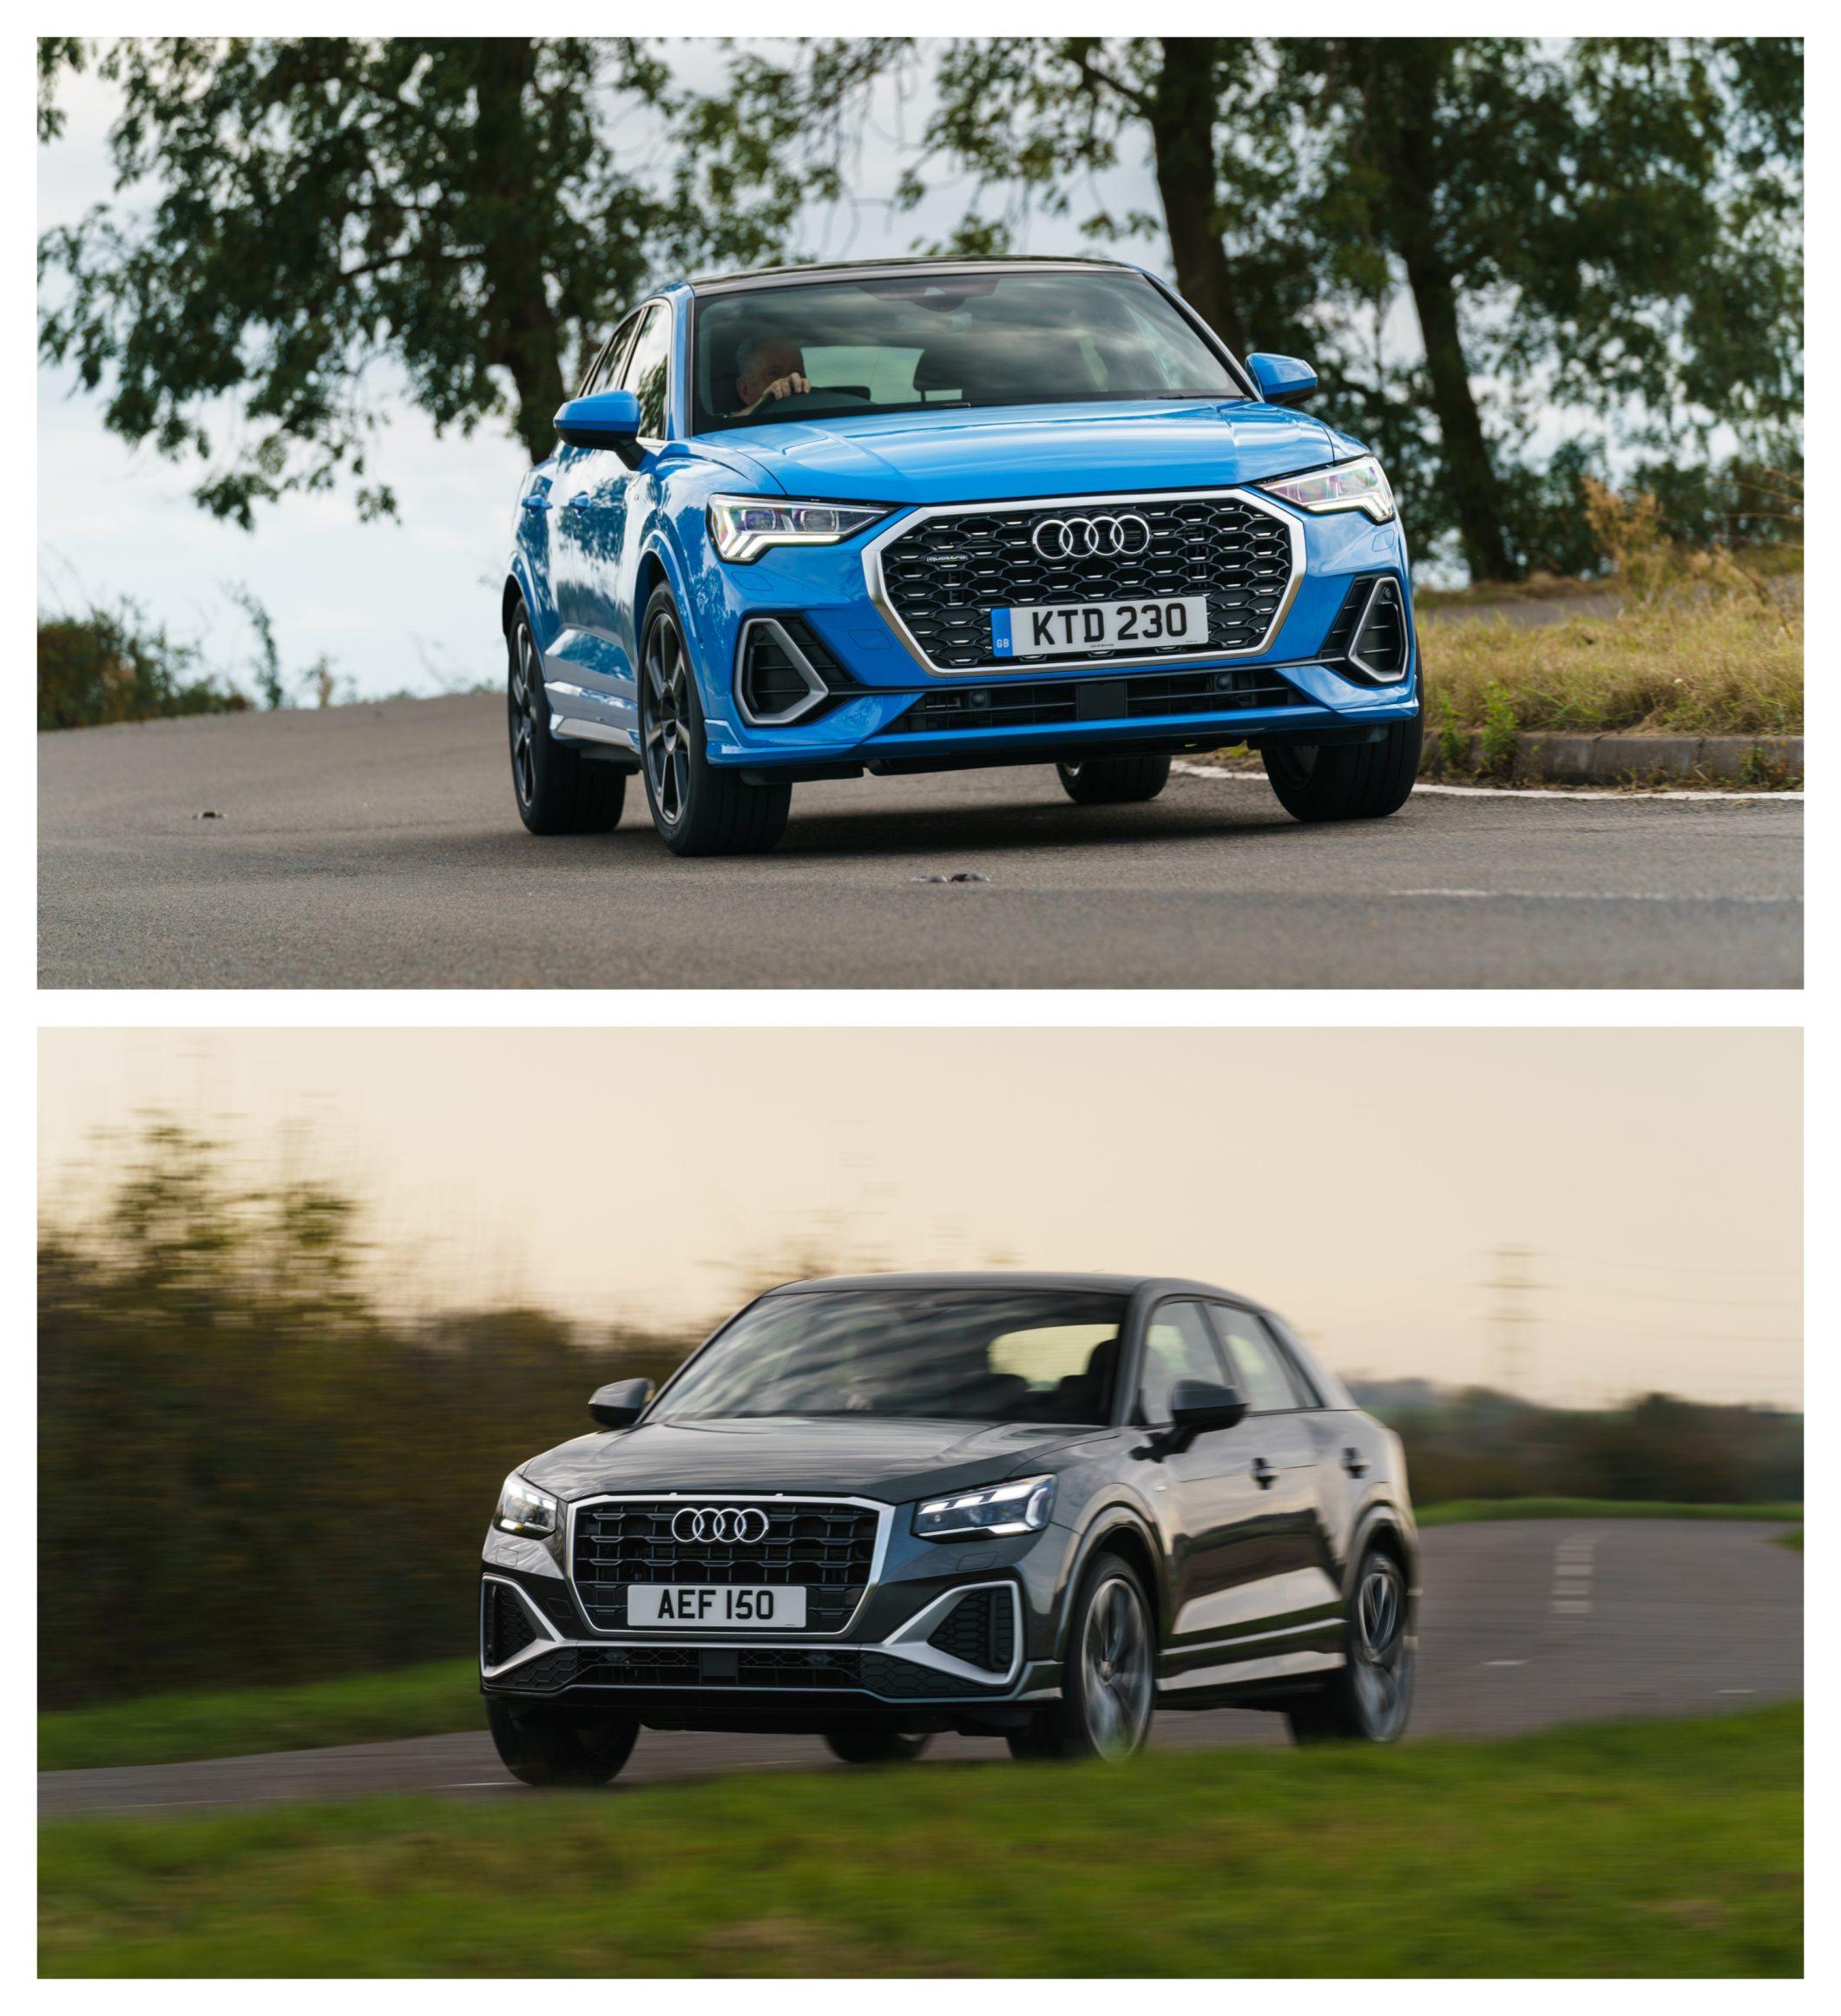 Audi Q2 Vs Audi Q3 - performance and price